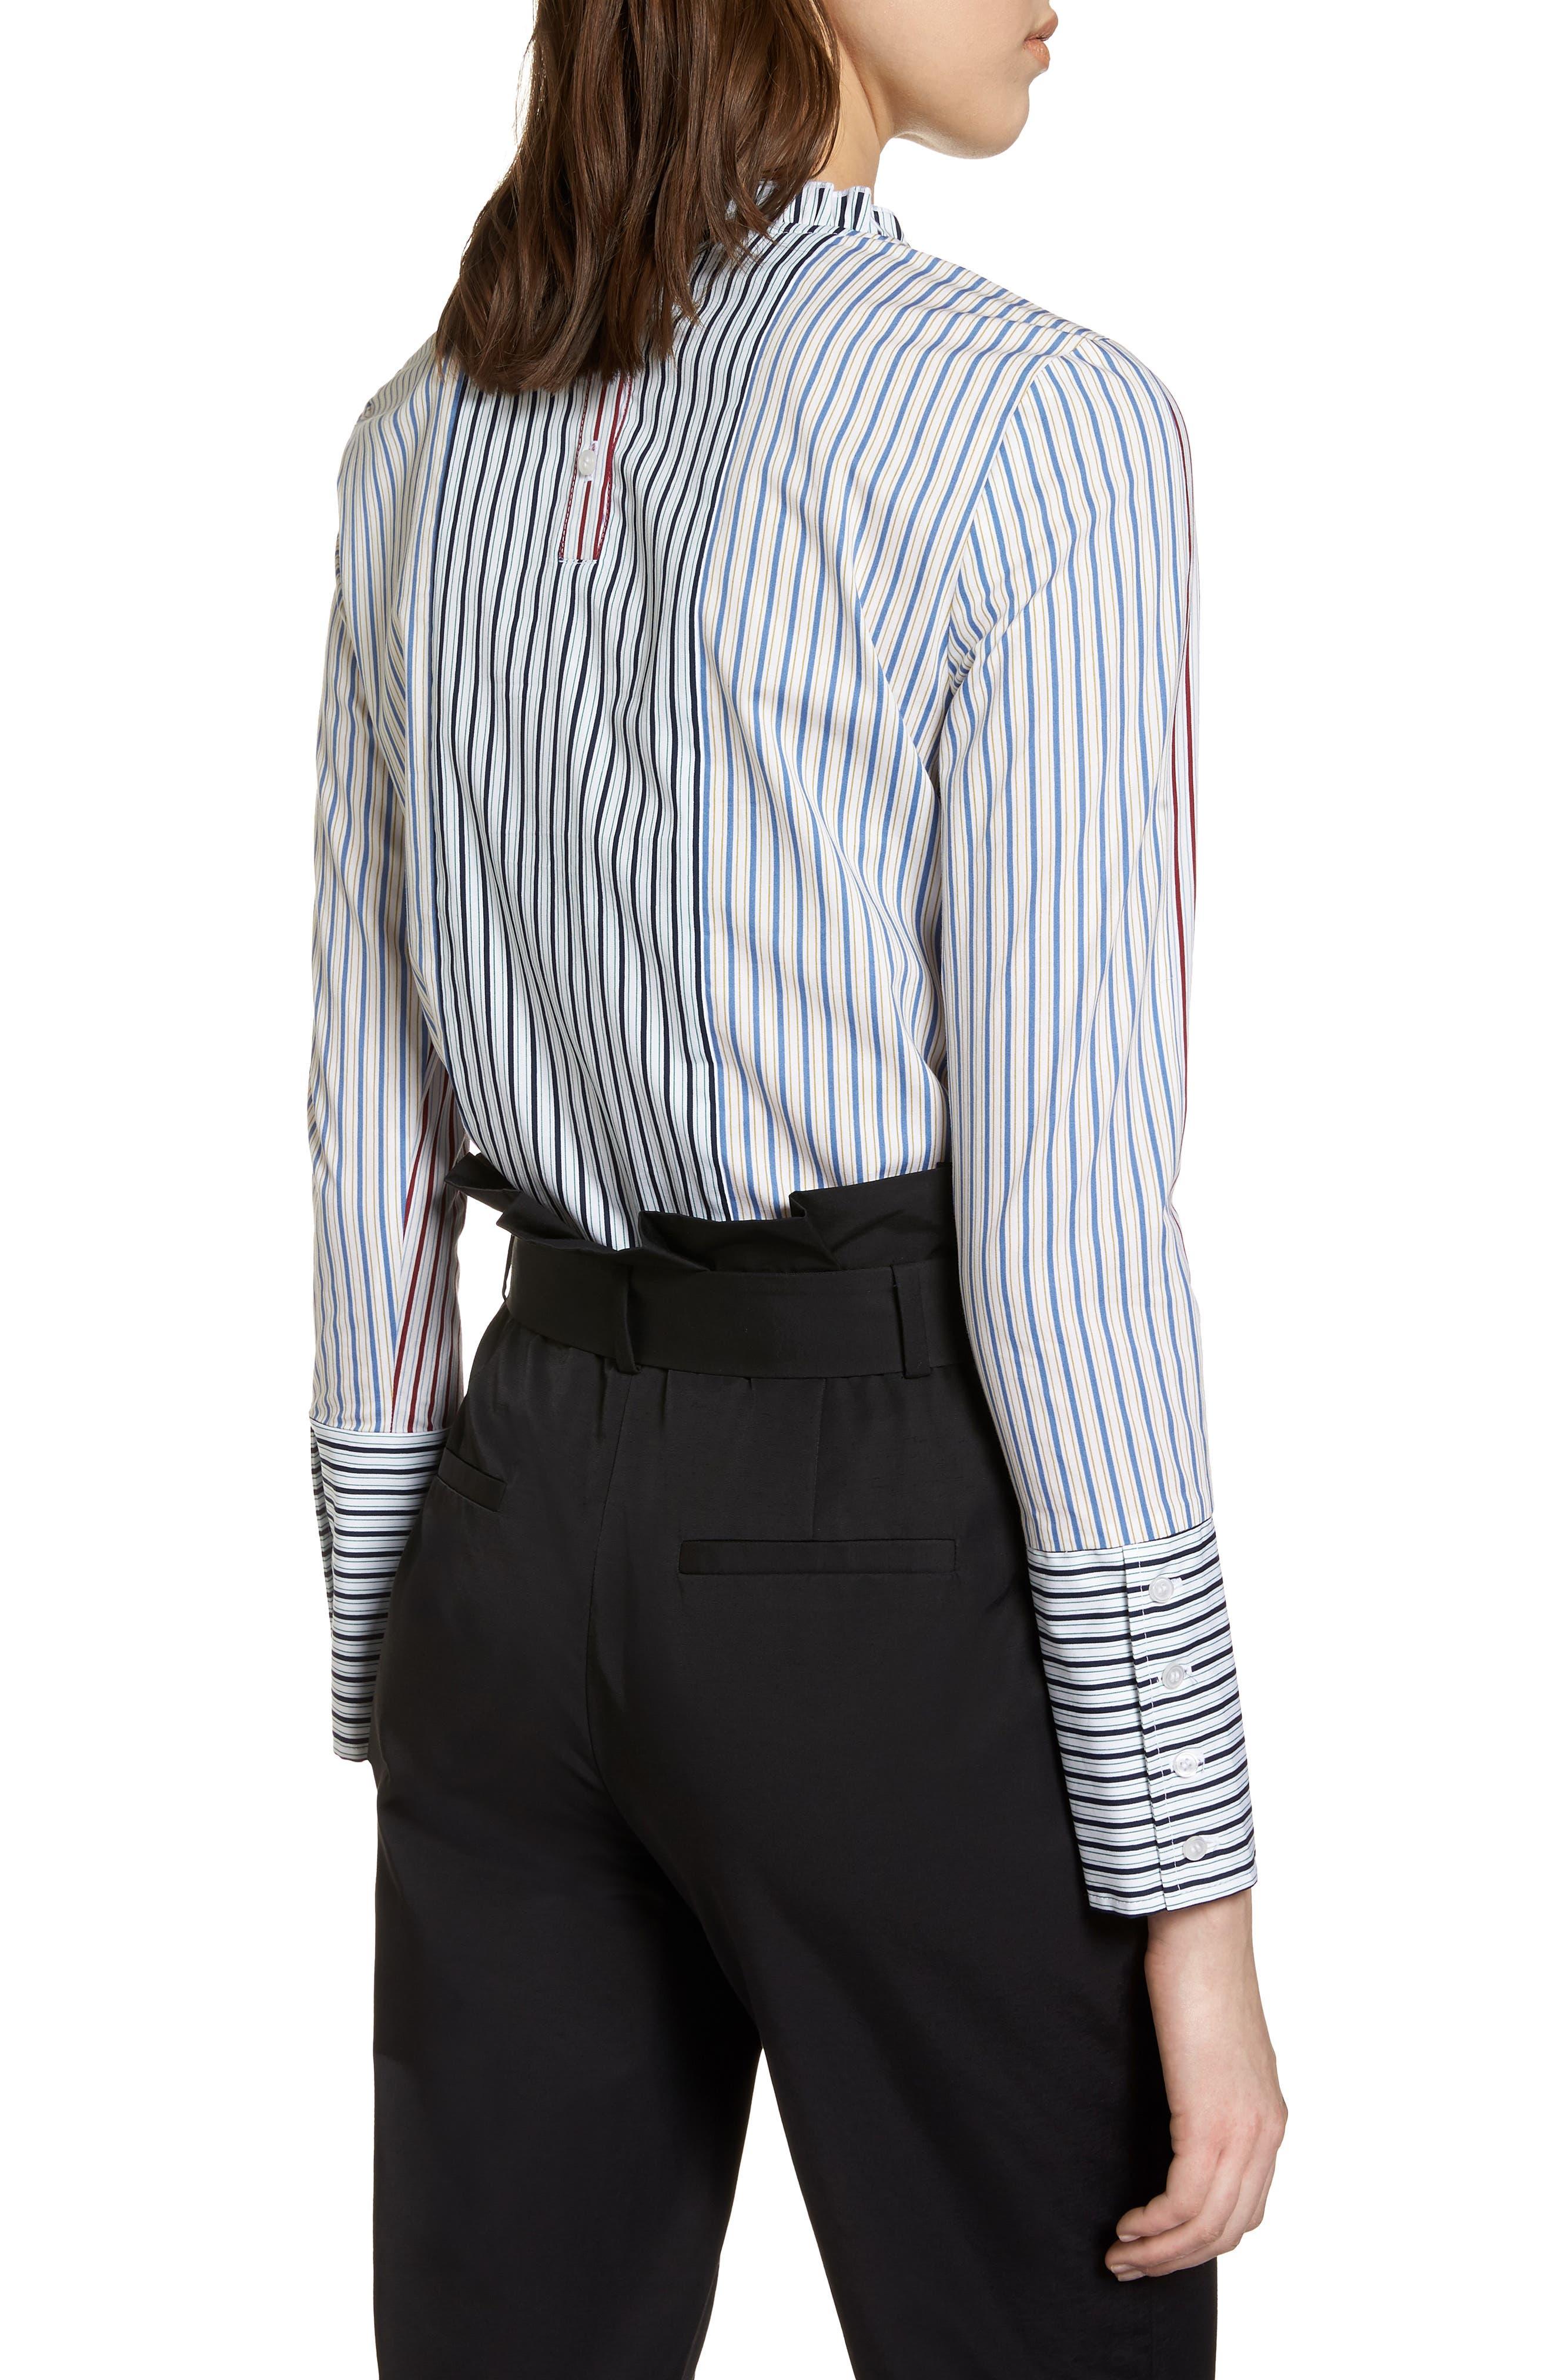 Mixed Stripe Cotton Shirt,                             Alternate thumbnail 2, color,                             White Multi Mix Stripe